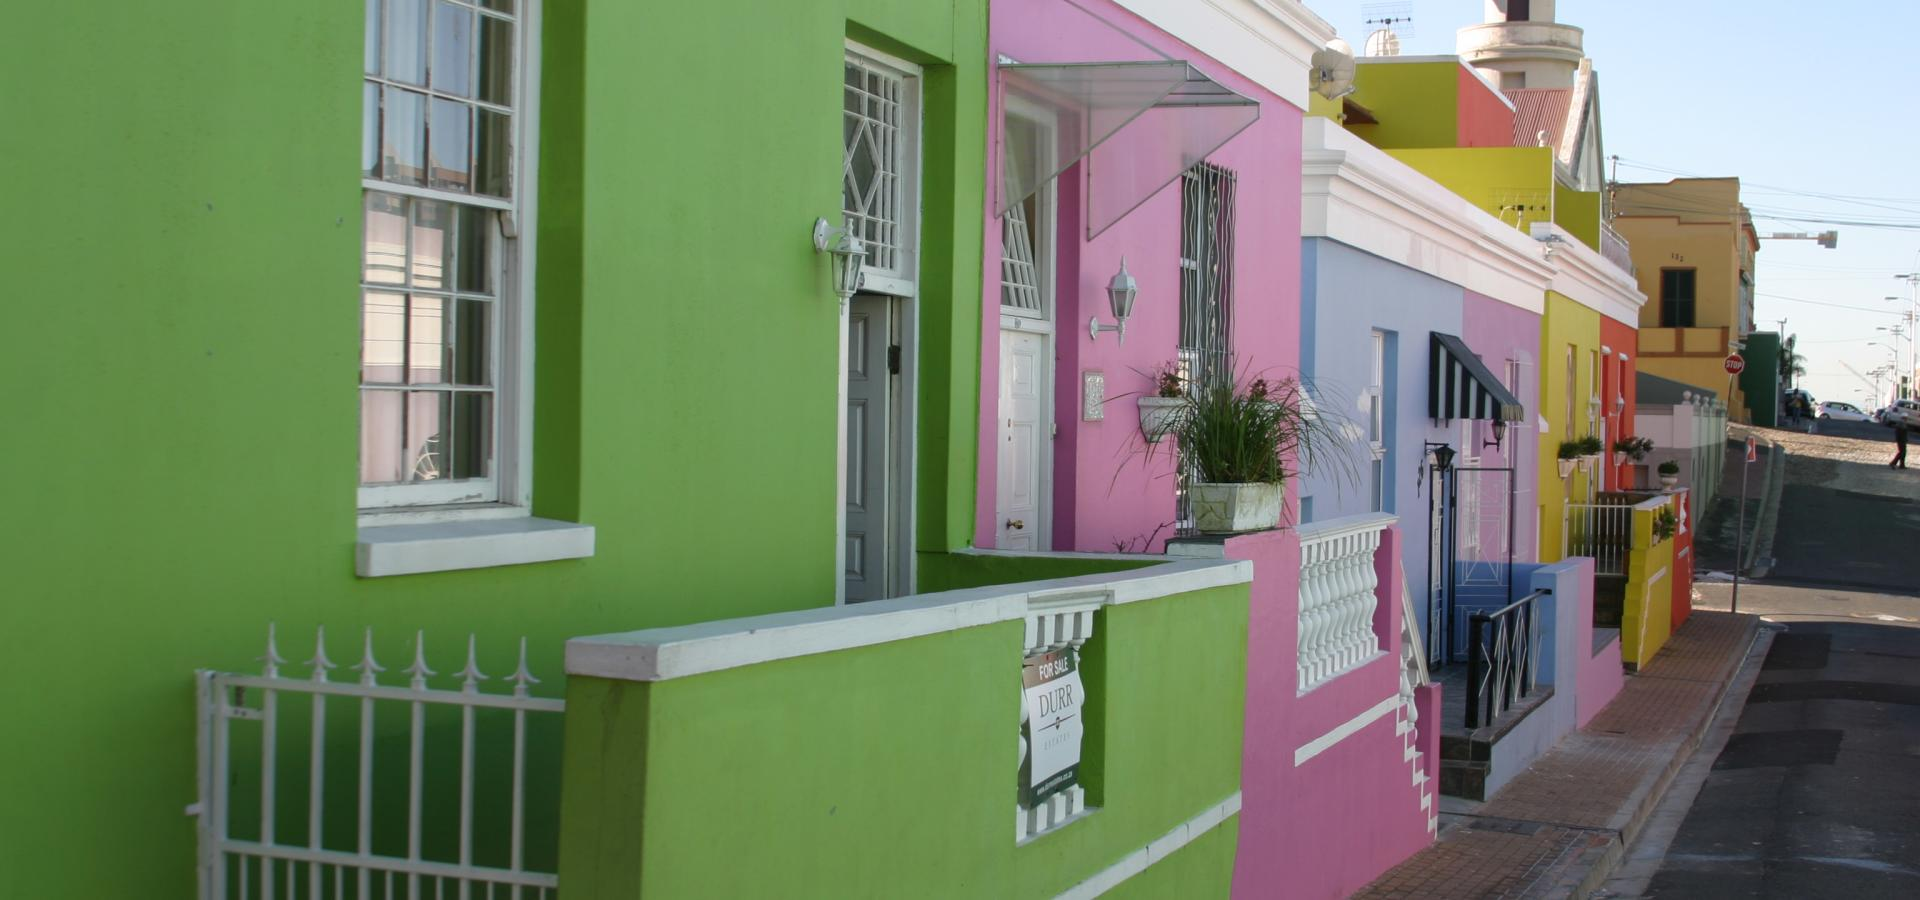 Das Bo-Kaap in Kapstadt erkennt man an seinen farbenfrohen Häusern